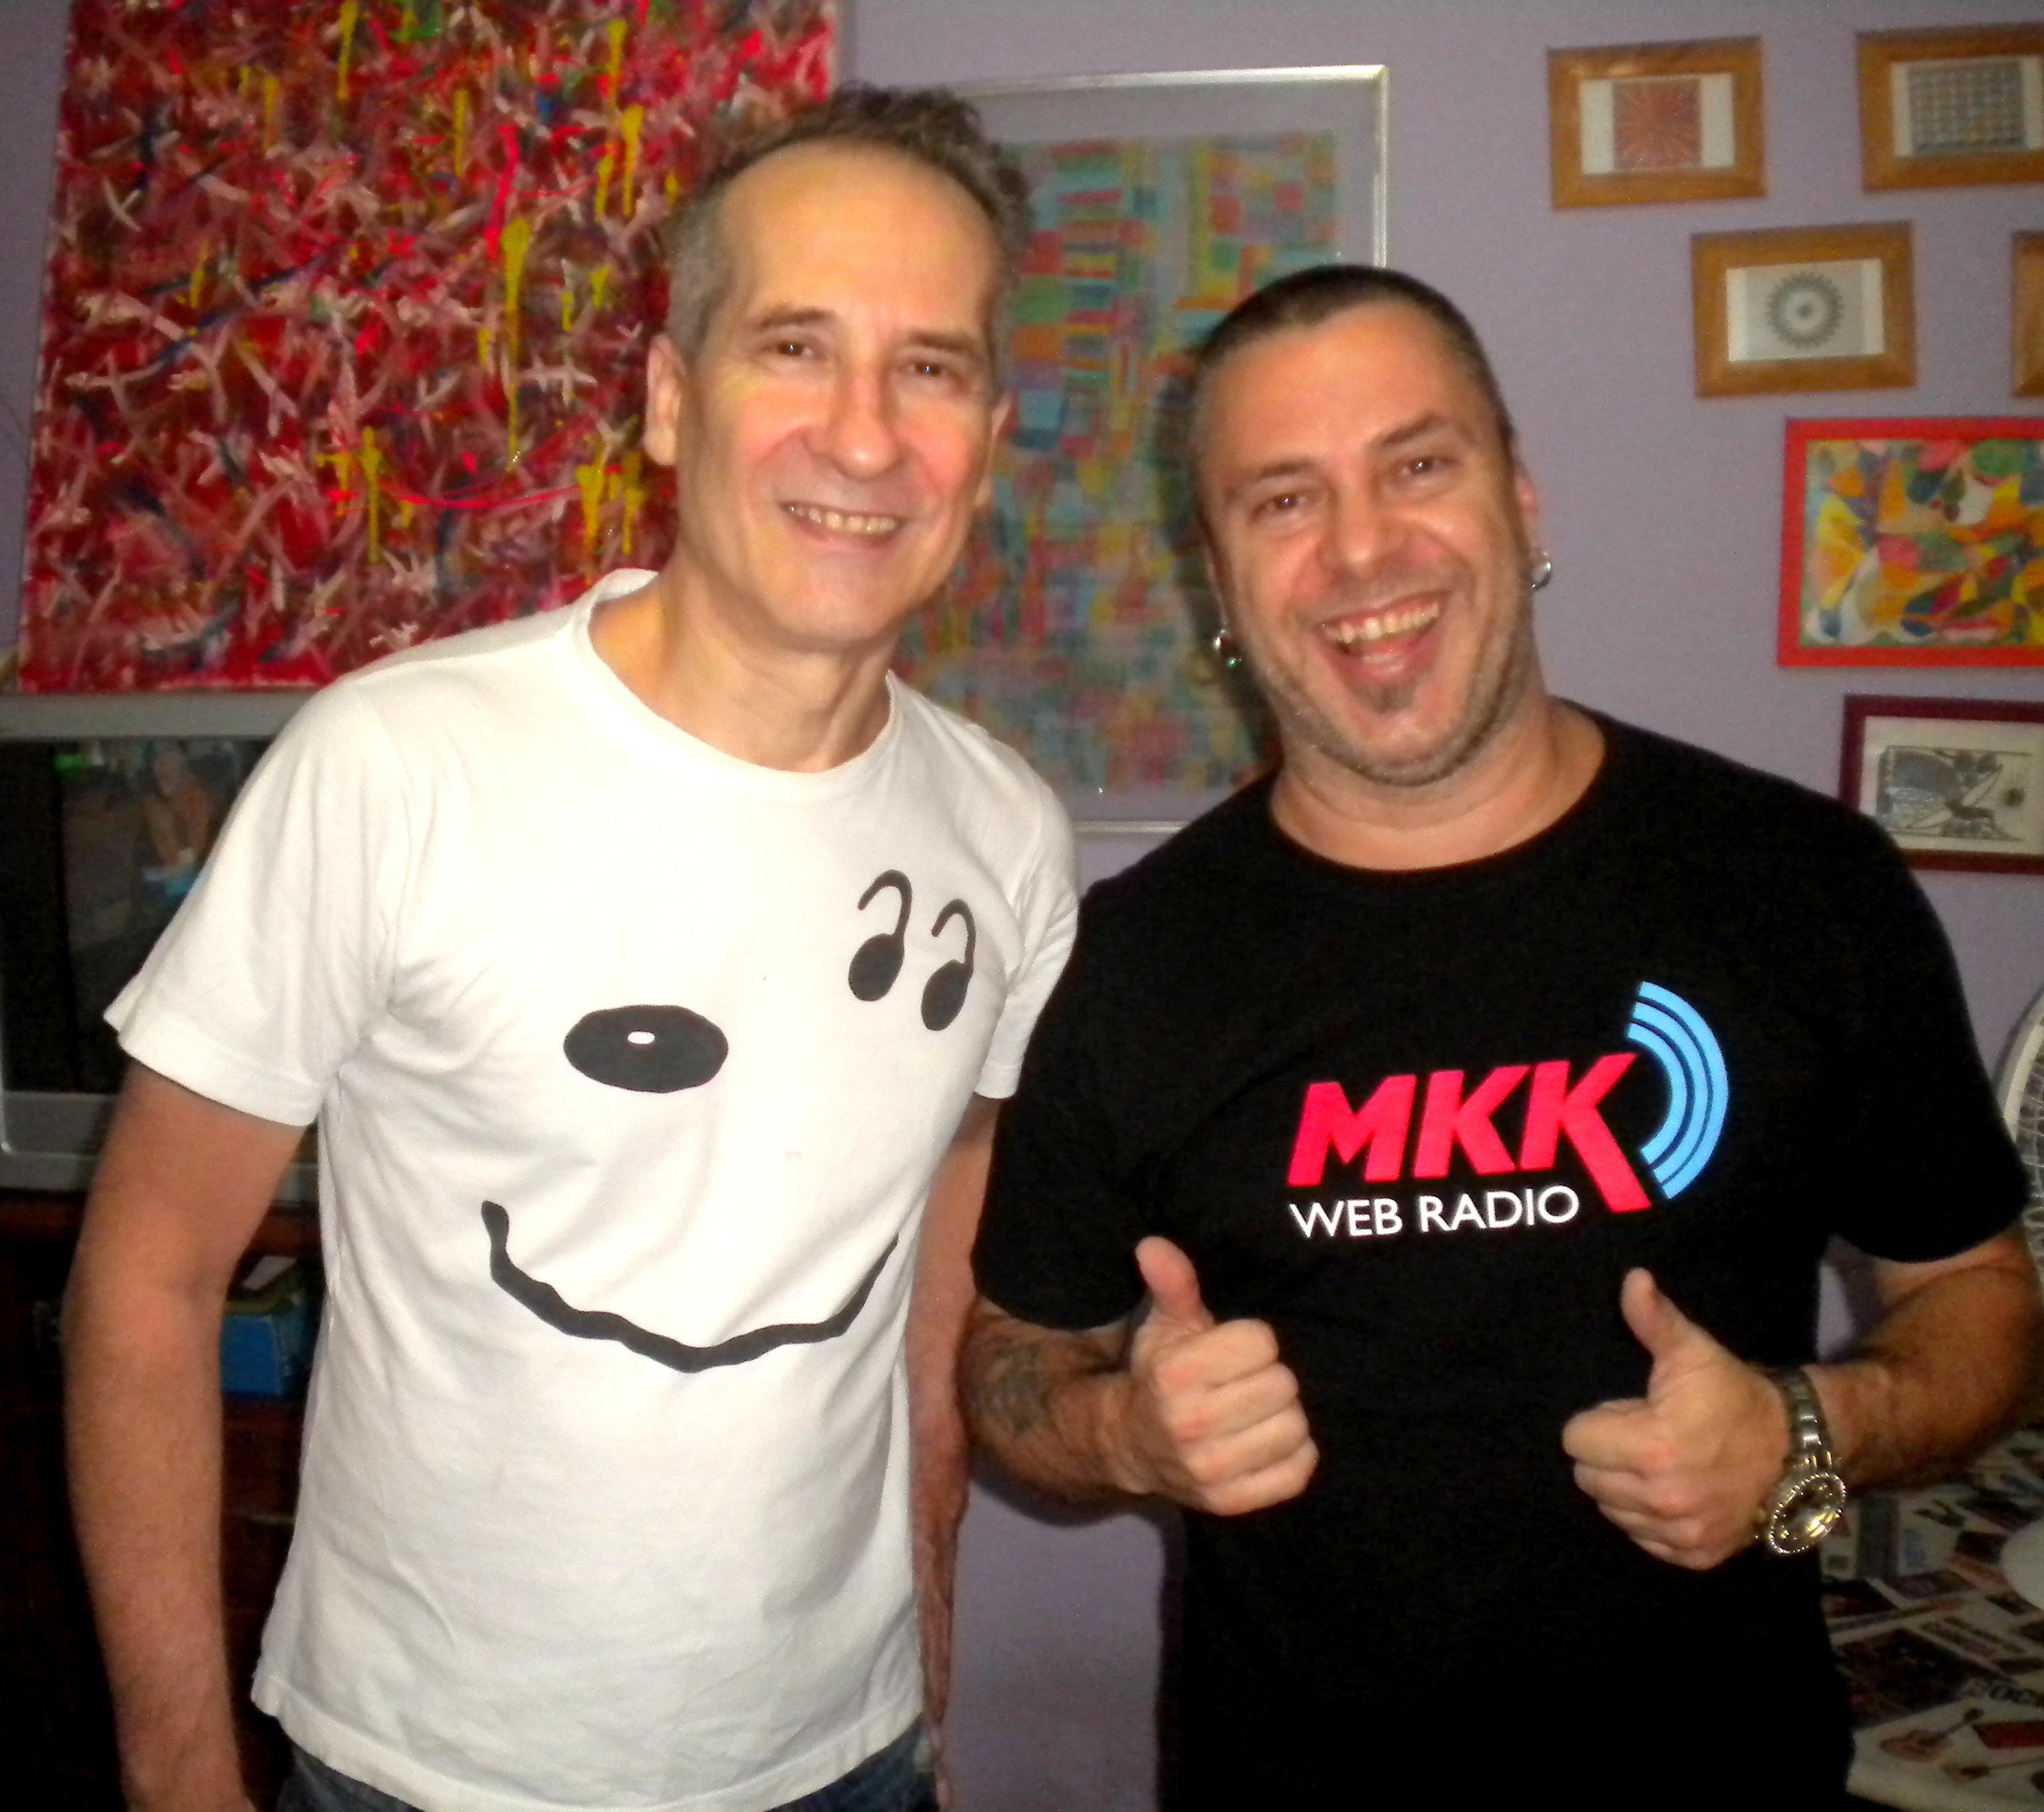 Markko Mendes e Kiko Zambiachi